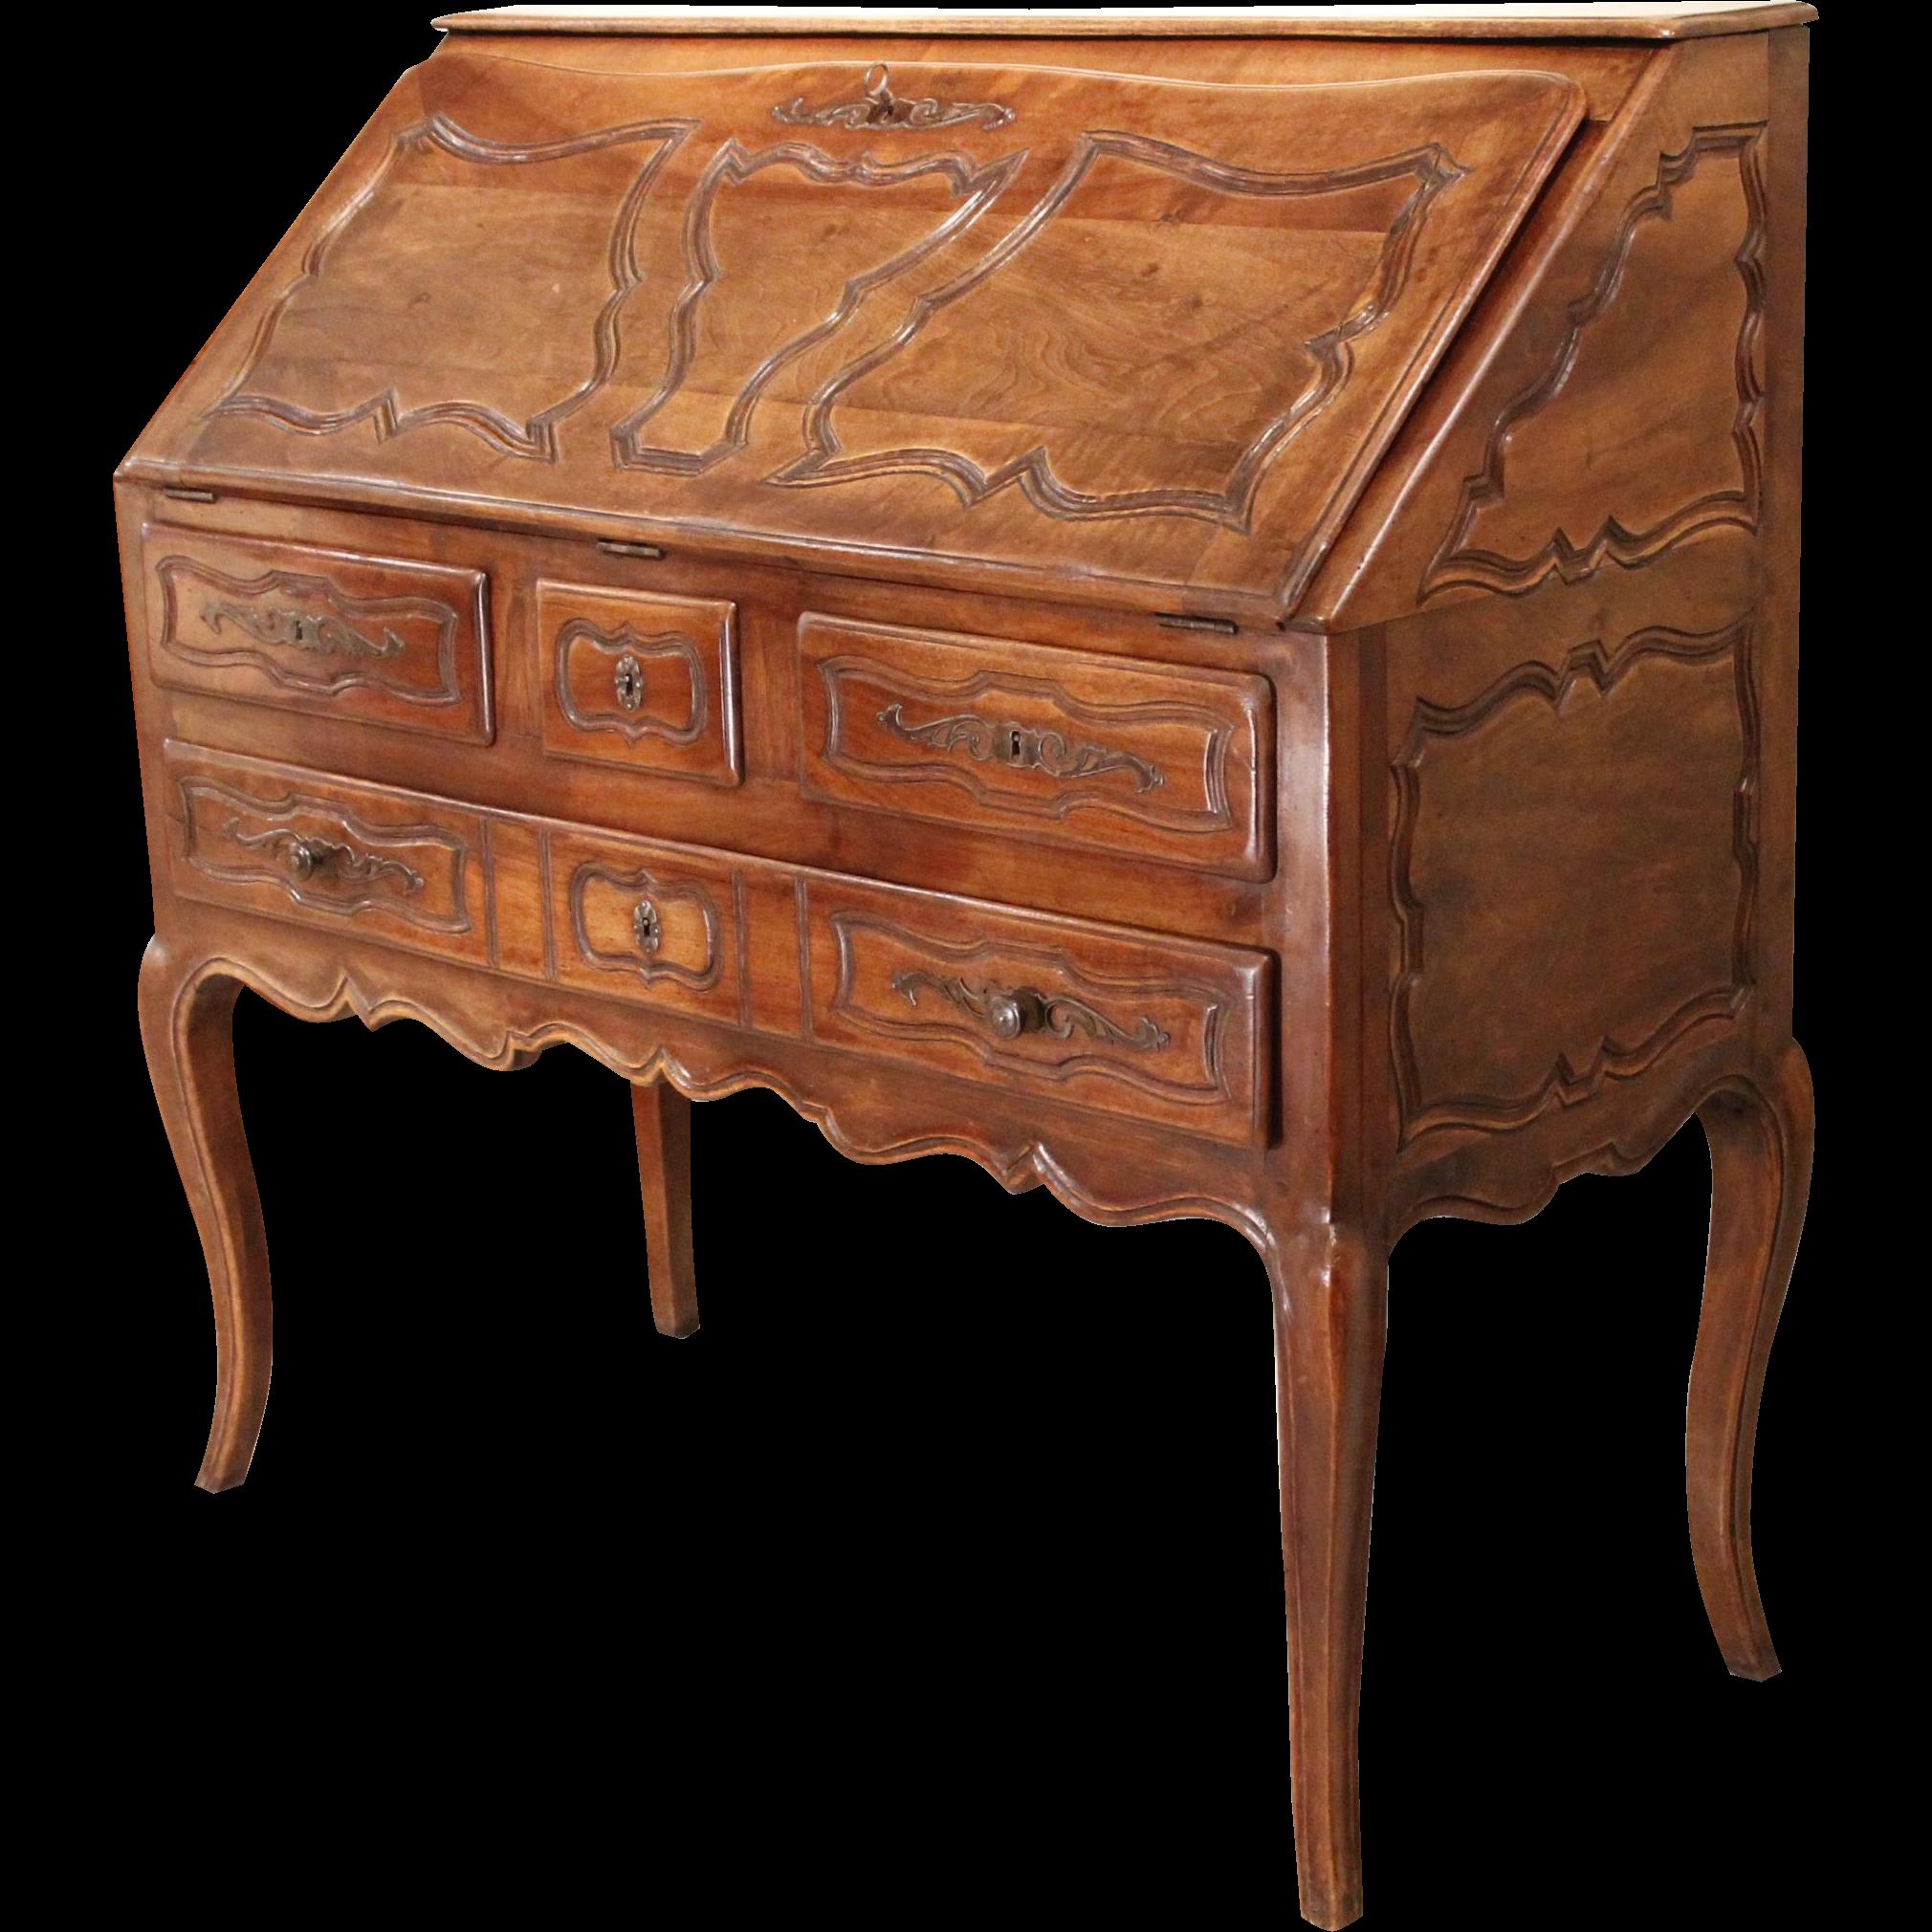 French Provincial Walnut Louis XV Style Slant Front Desk